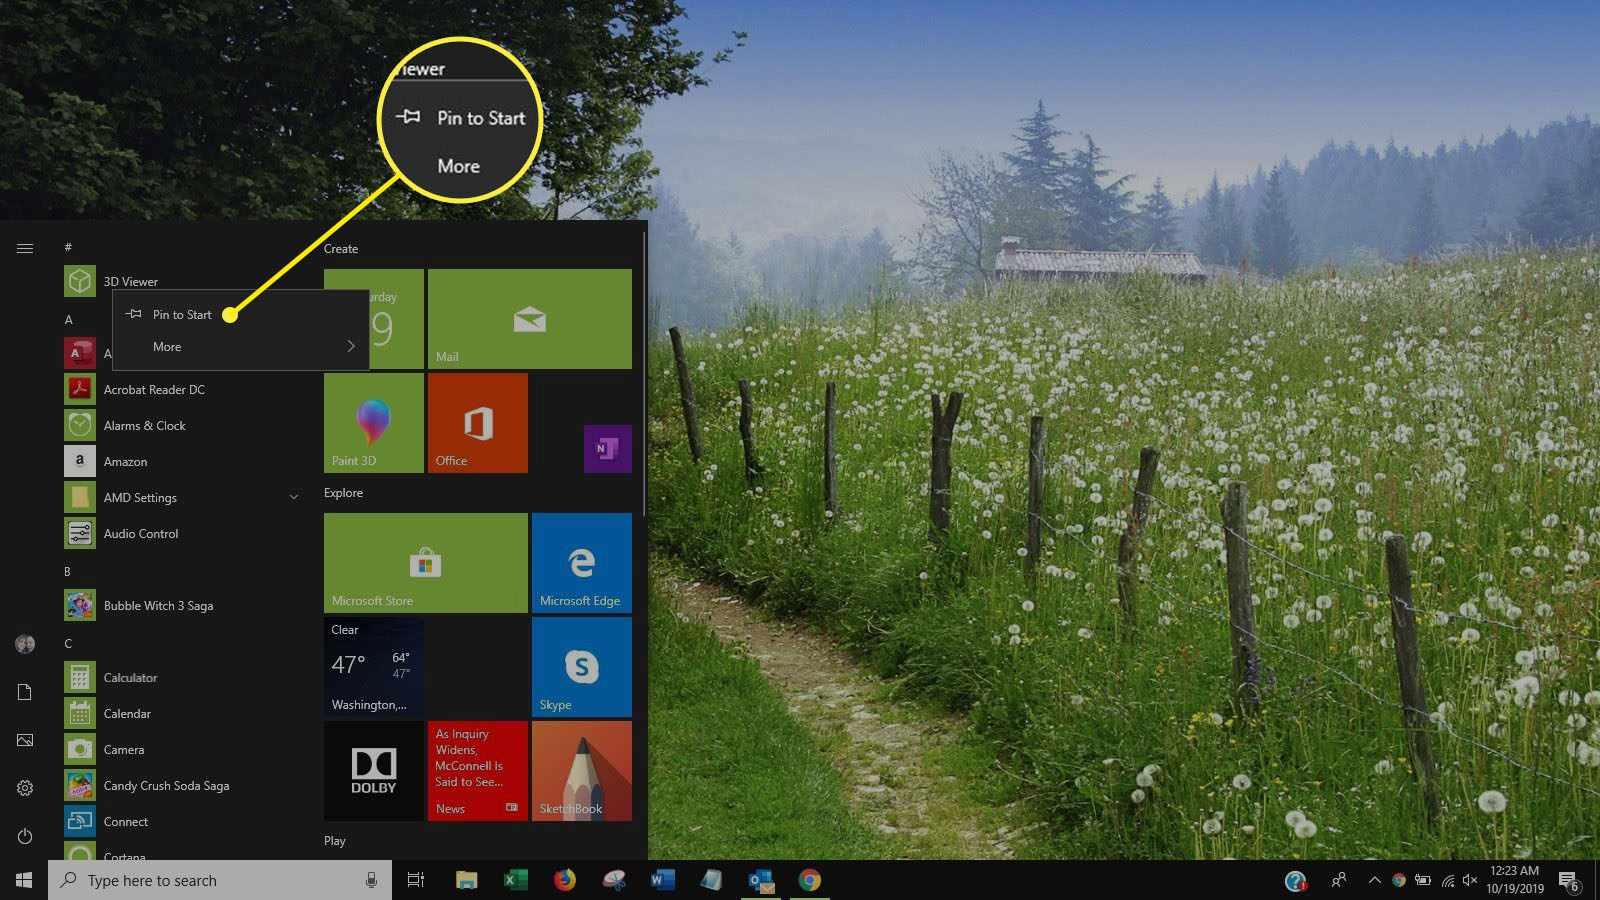 Screenshot of right-click menu in Start menu app